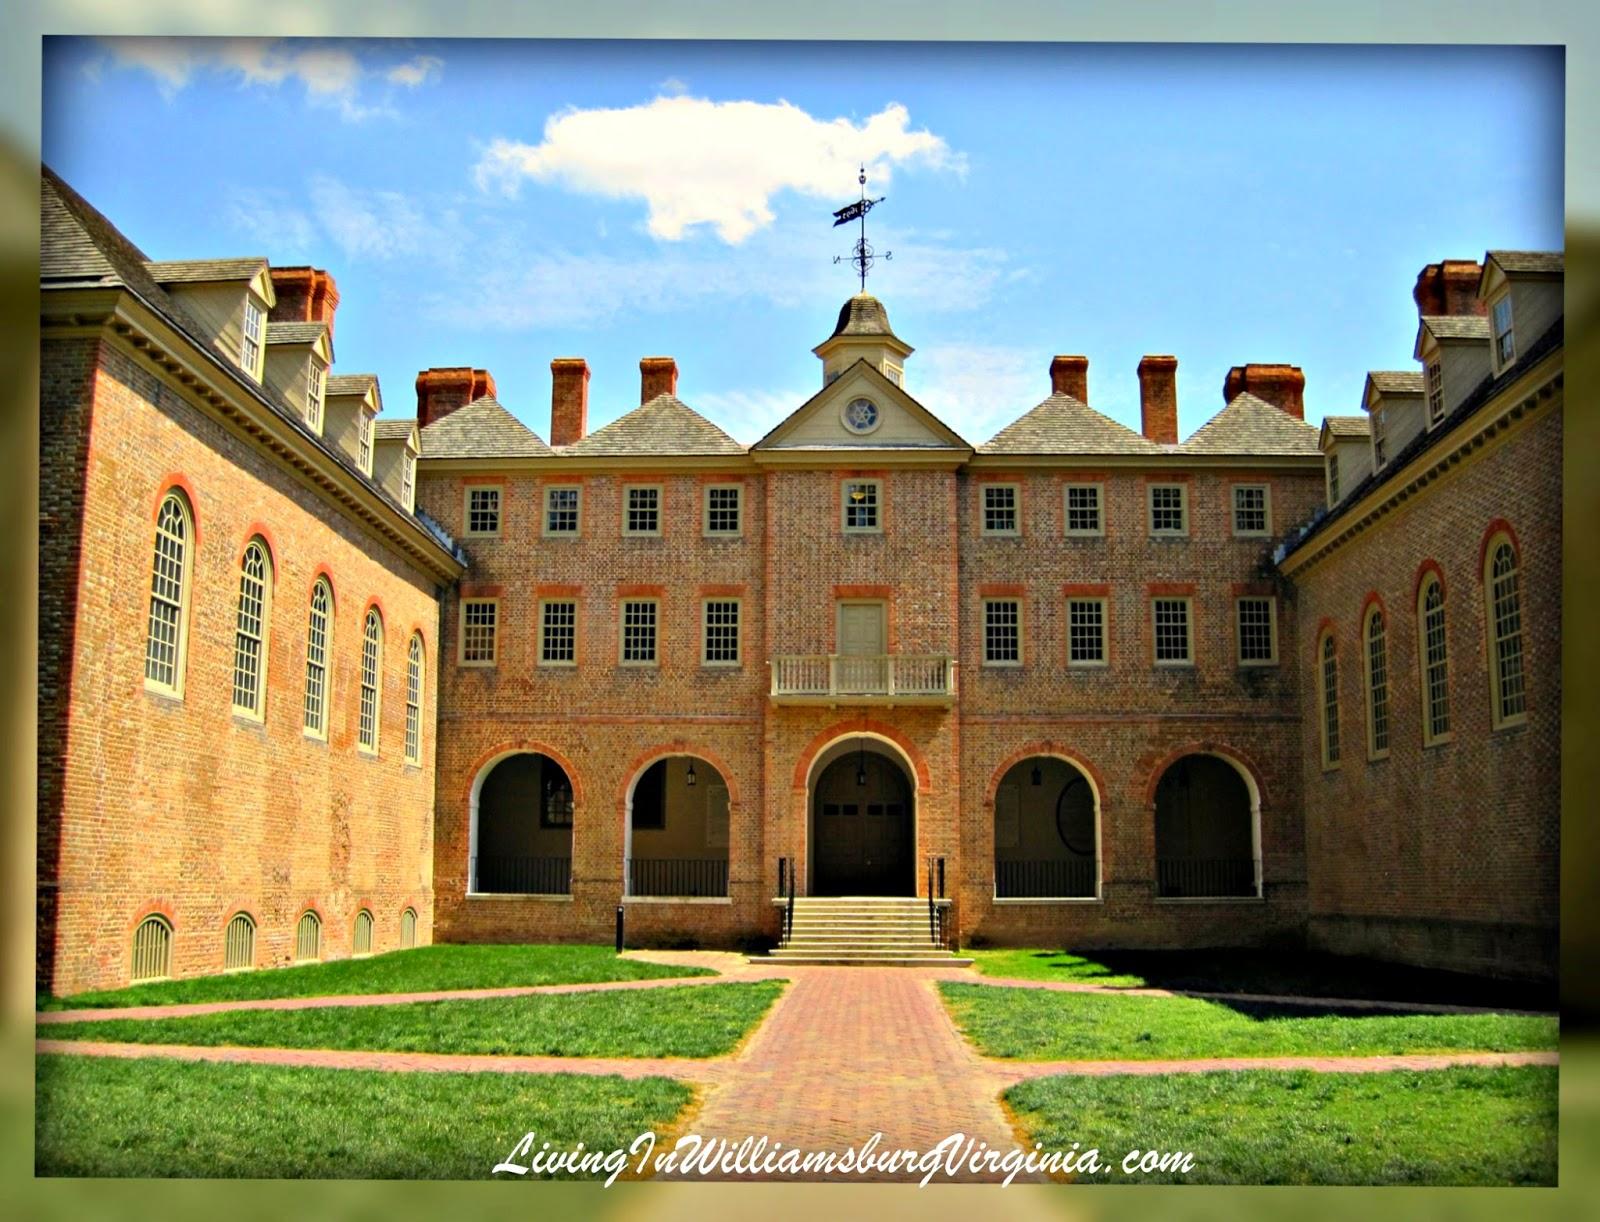 Living In Williamsburg, Virginia: The Wren Building, College of ...